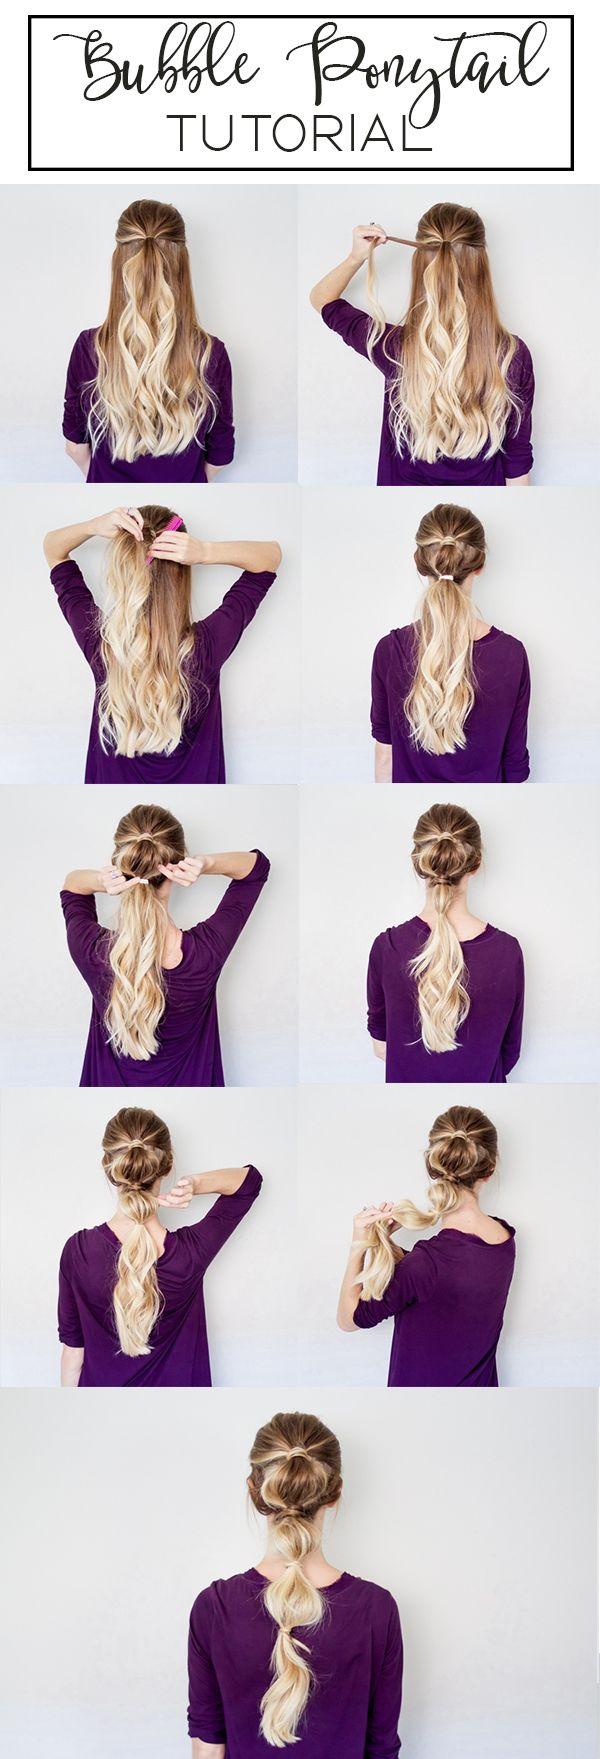 Astonishing 1000 Ideas About Bubble Ponytail On Pinterest Braids Waterfall Short Hairstyles For Black Women Fulllsitofus